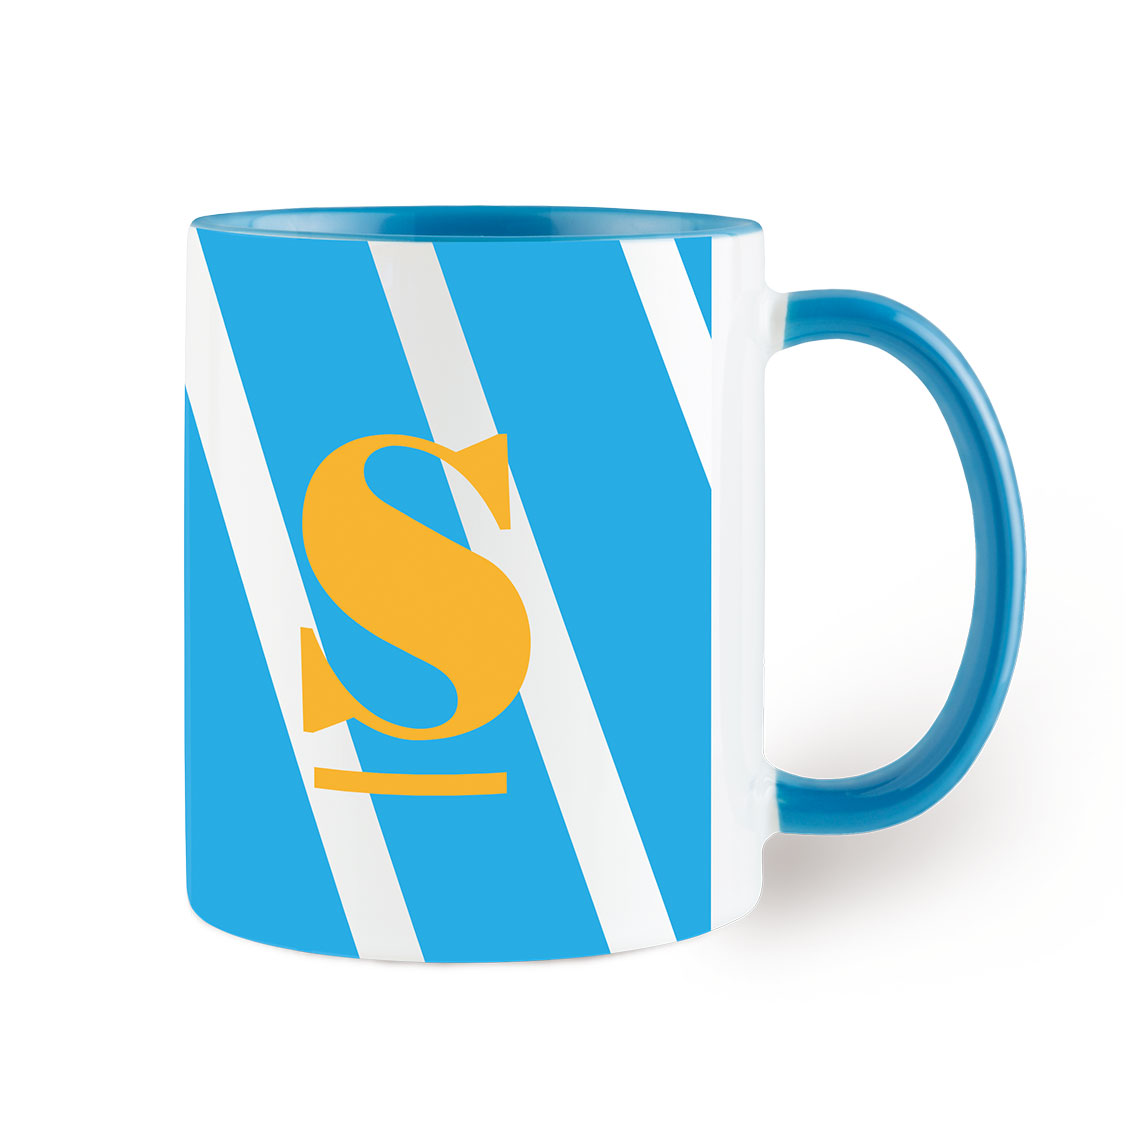 sky blue coffee mug 11 oz sky blue colorful mug mugs gifts snapfish us - Colorful Mugs